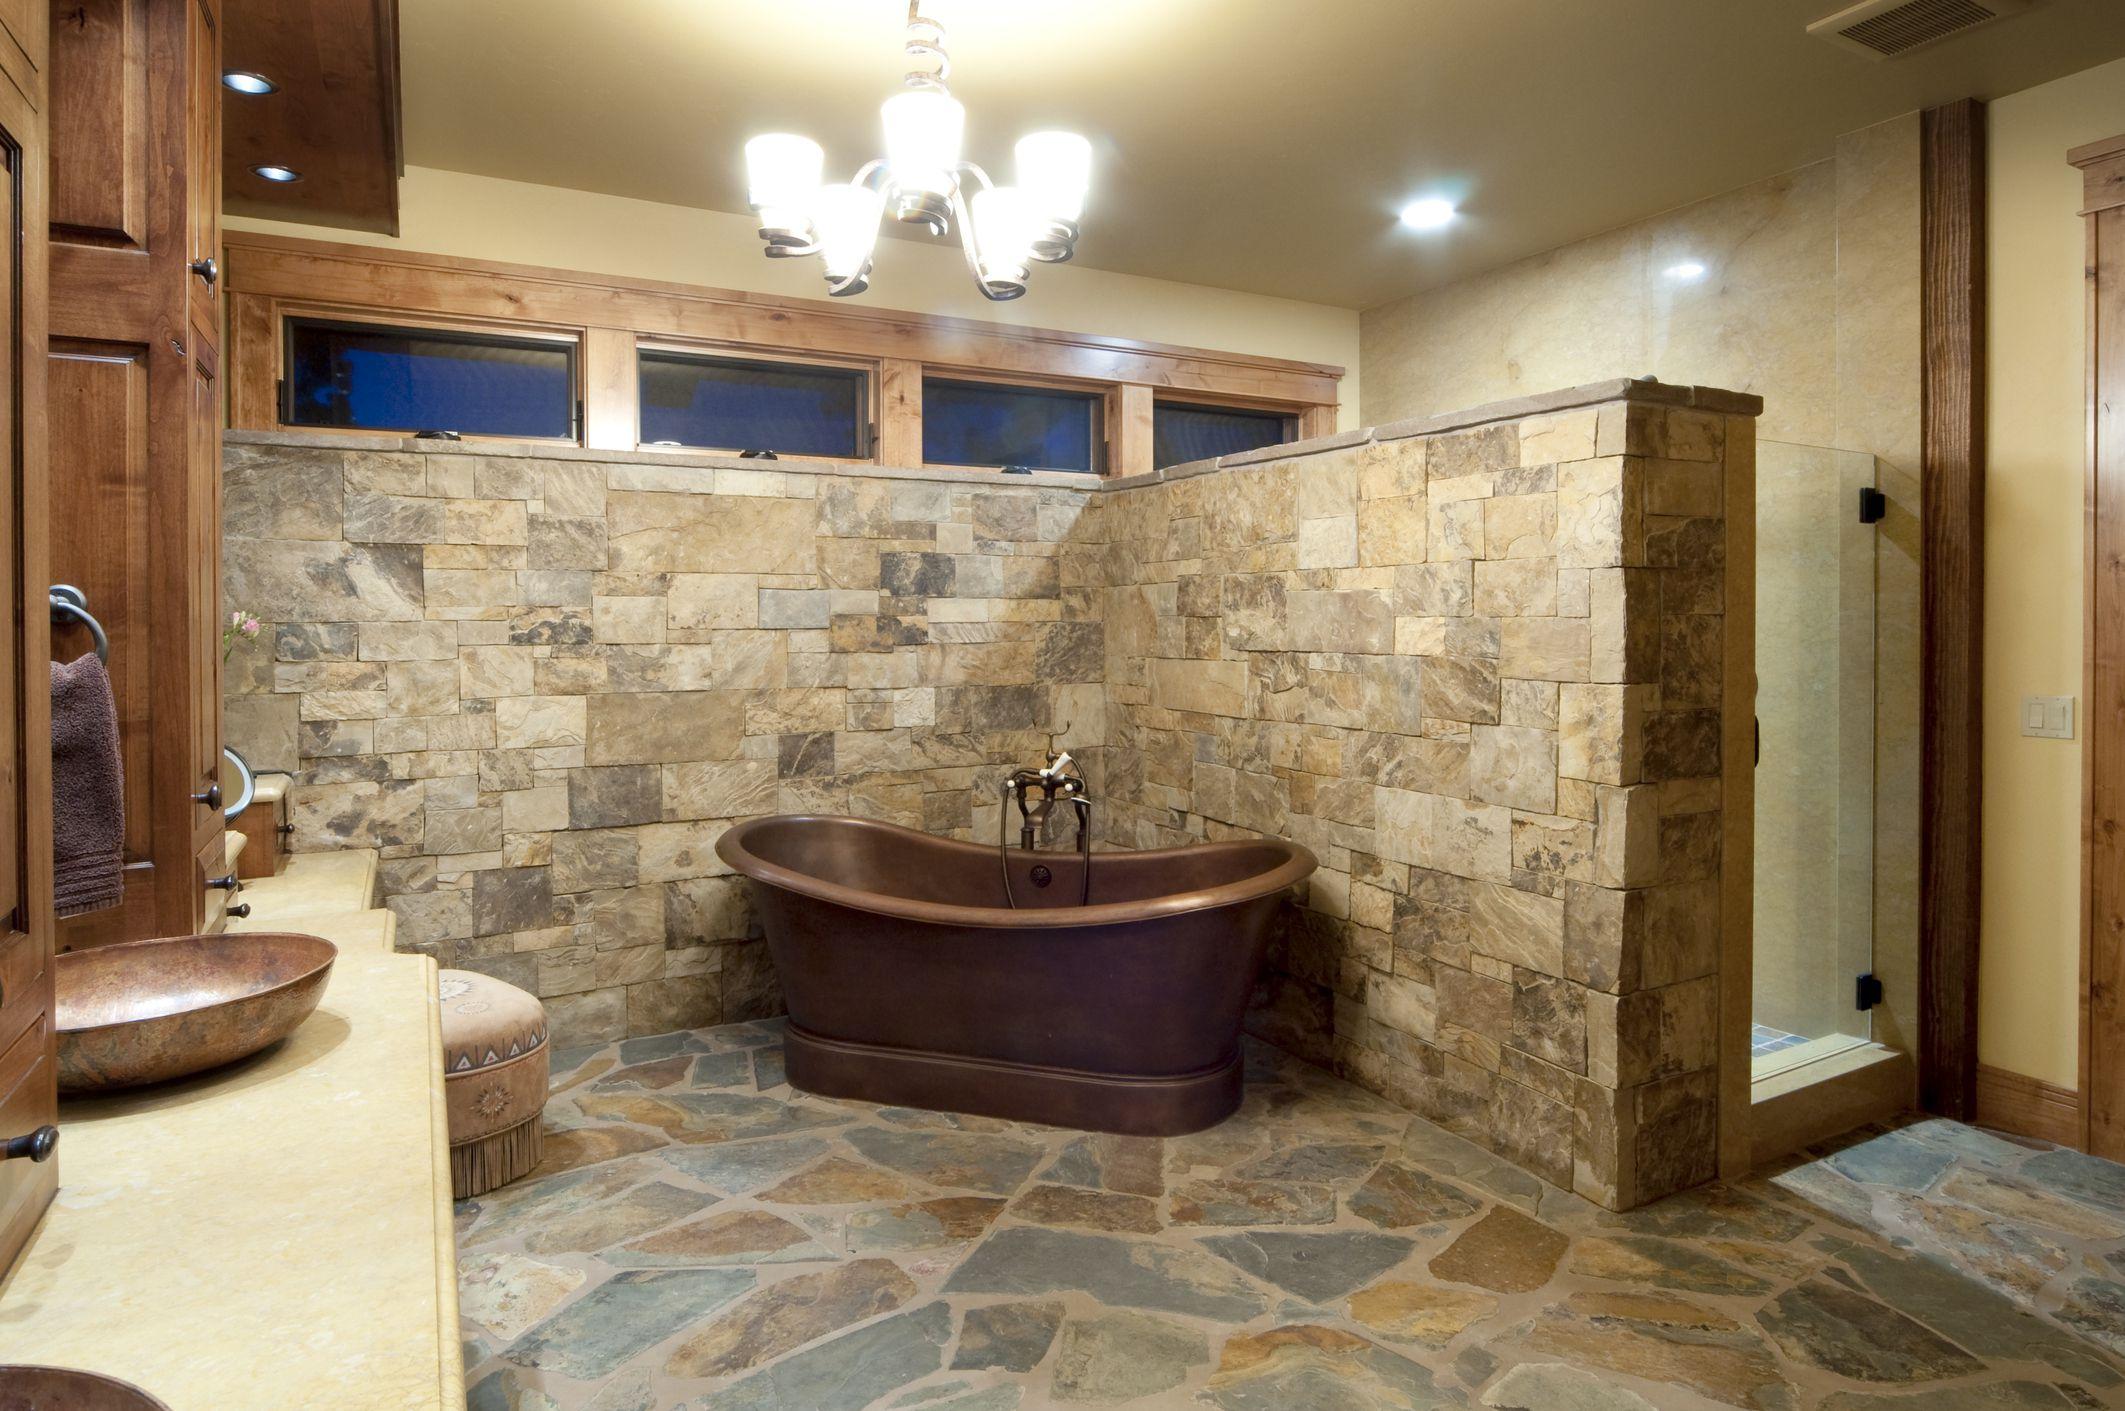 Brick floor bathroom - Brick Floor Bathroom 1